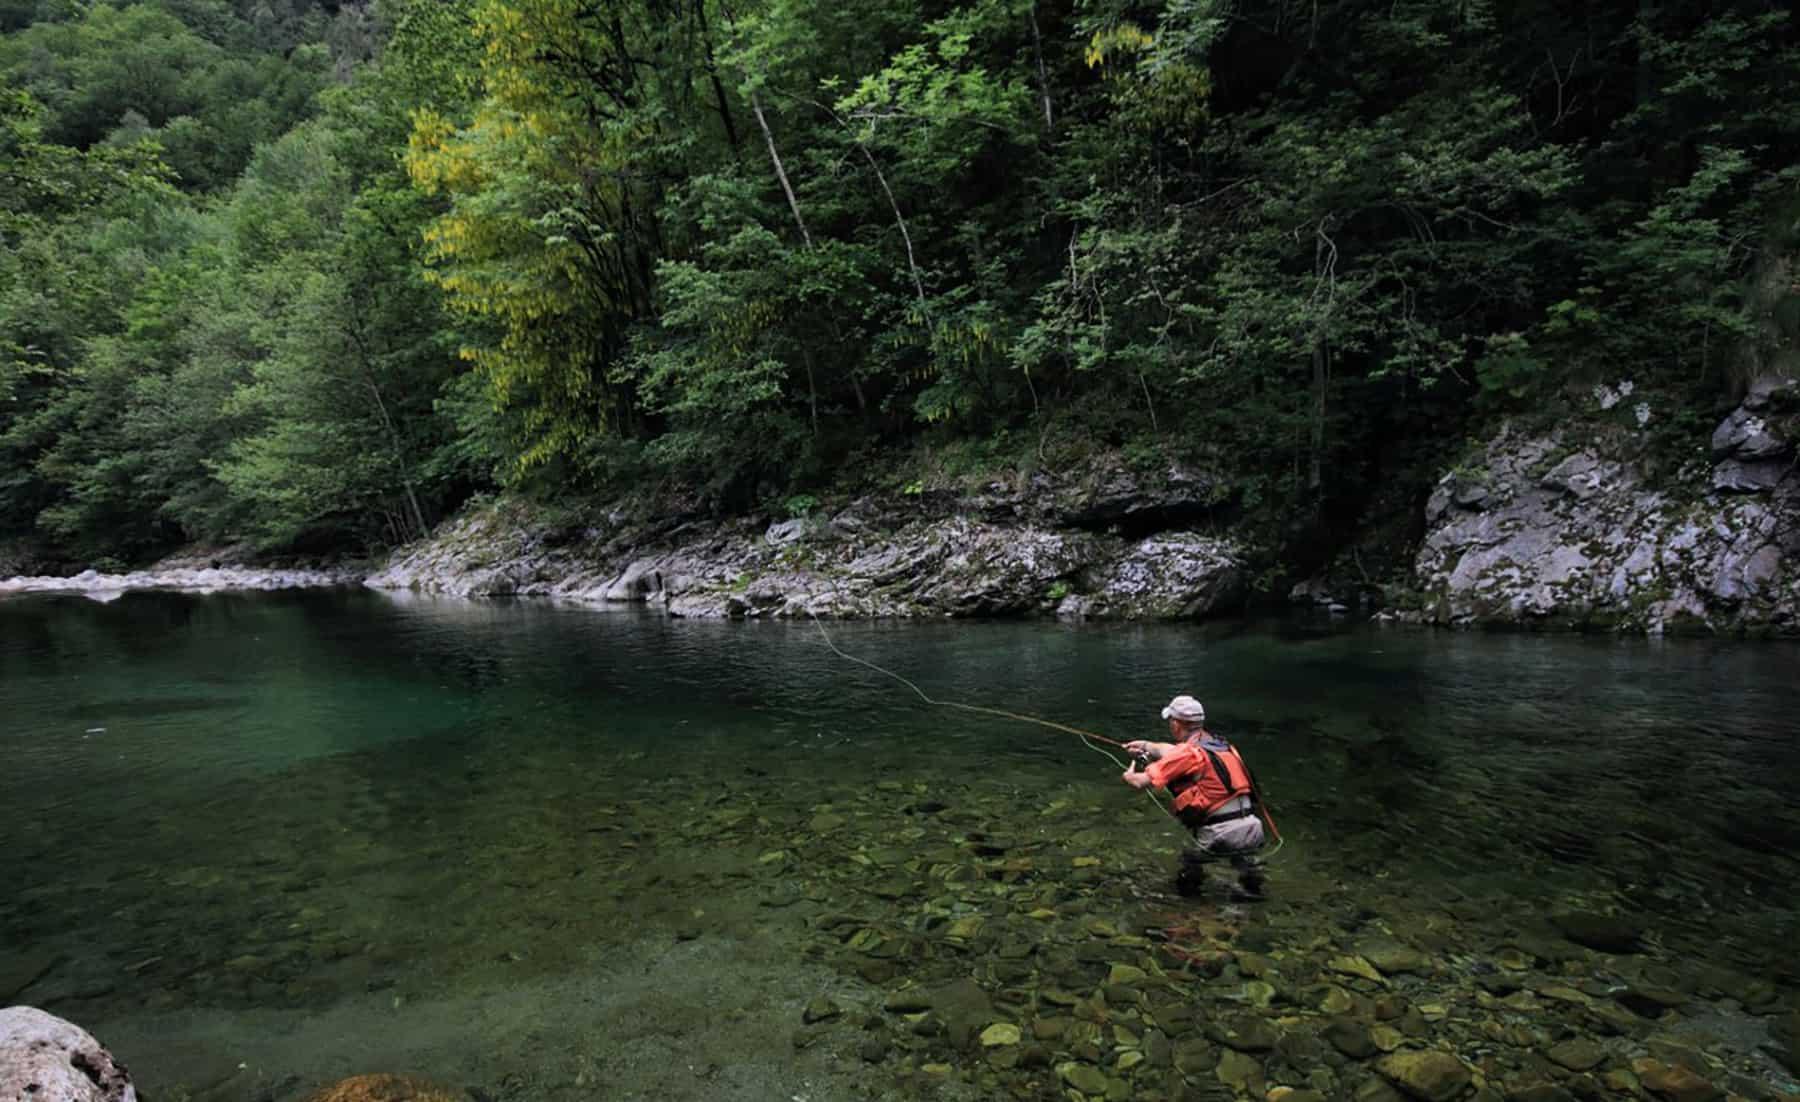 Fly fishing on the River Tara